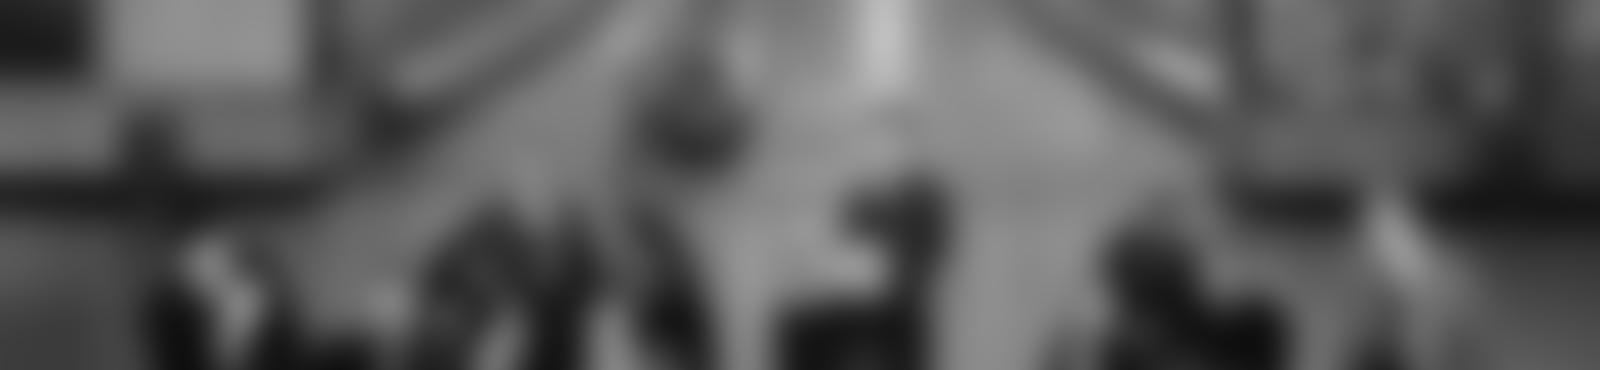 Blurred d286a632 476f 4543 bc4b 4999ec9d65fd